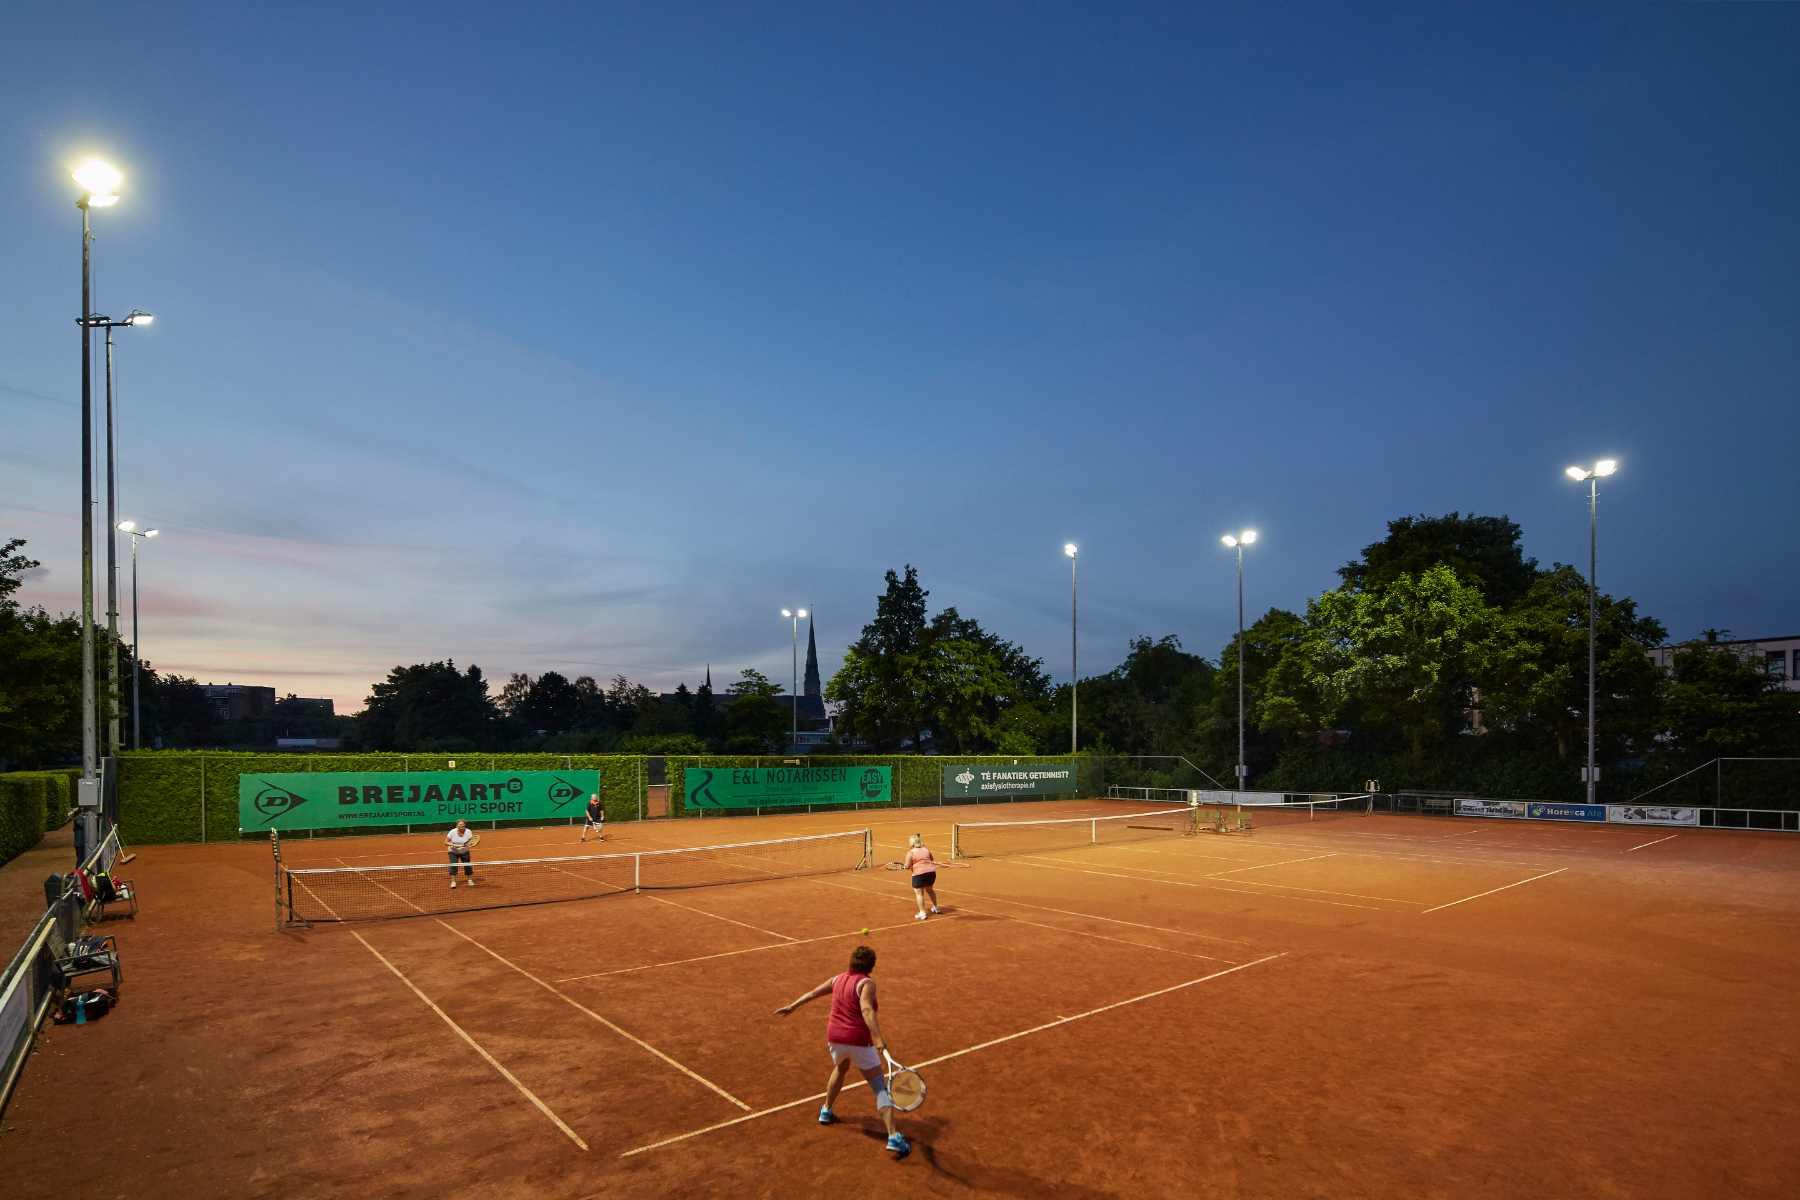 https://sportverlichting.com/wp-content/uploads/2019/10/TV-Markant-Breda_0003.jpg